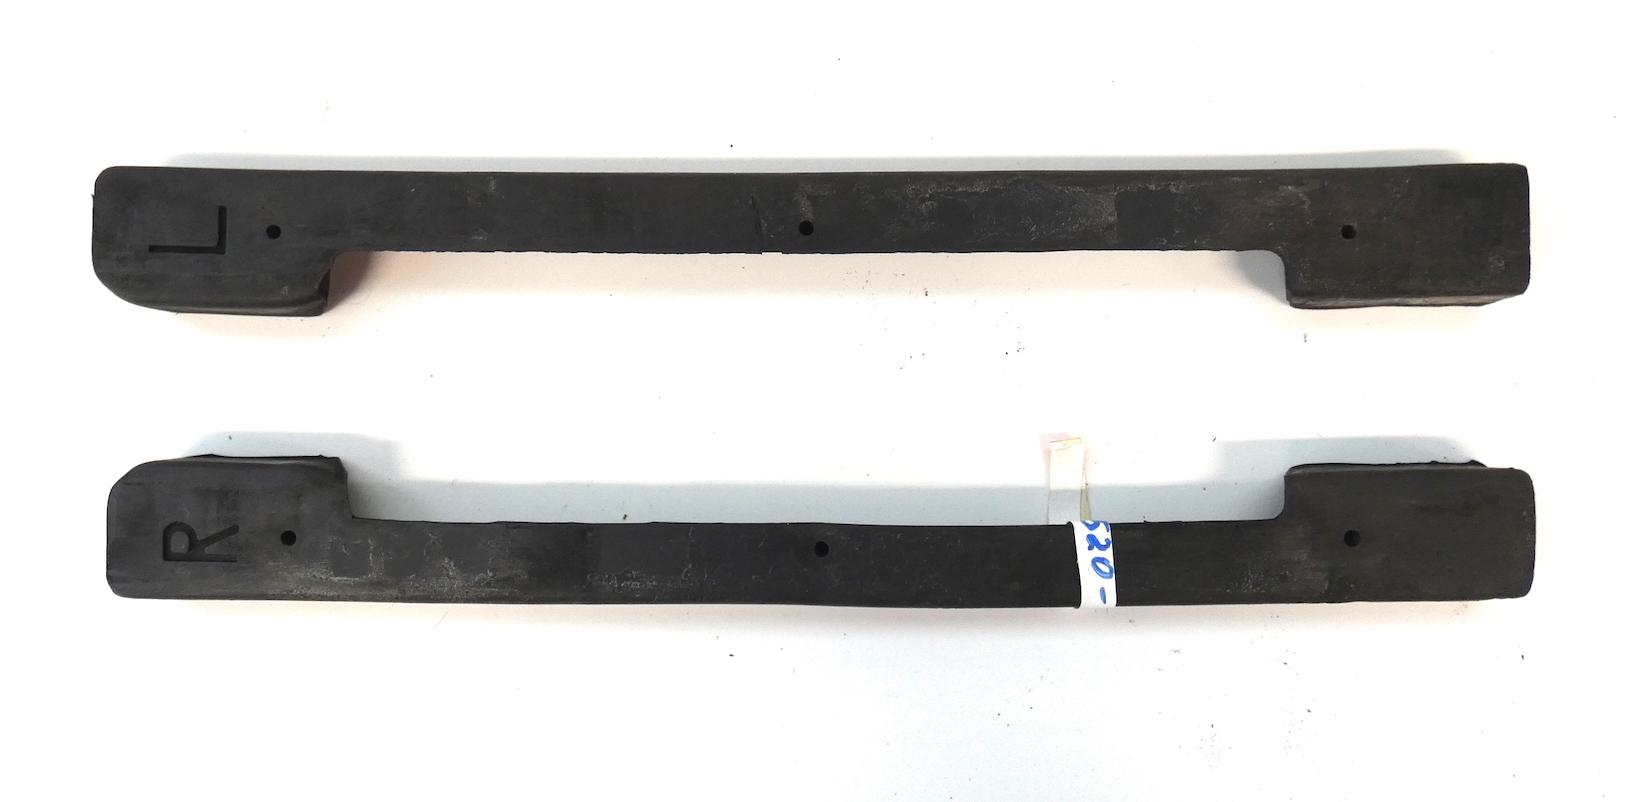 Auspuffkr/ümmerdichtung Dichtung Zylinderkopf Auspuffkr/ümmerdichtung Kr/ümmerdichtung Innen 1610-12950 Abgaskr/ümmerdichtung